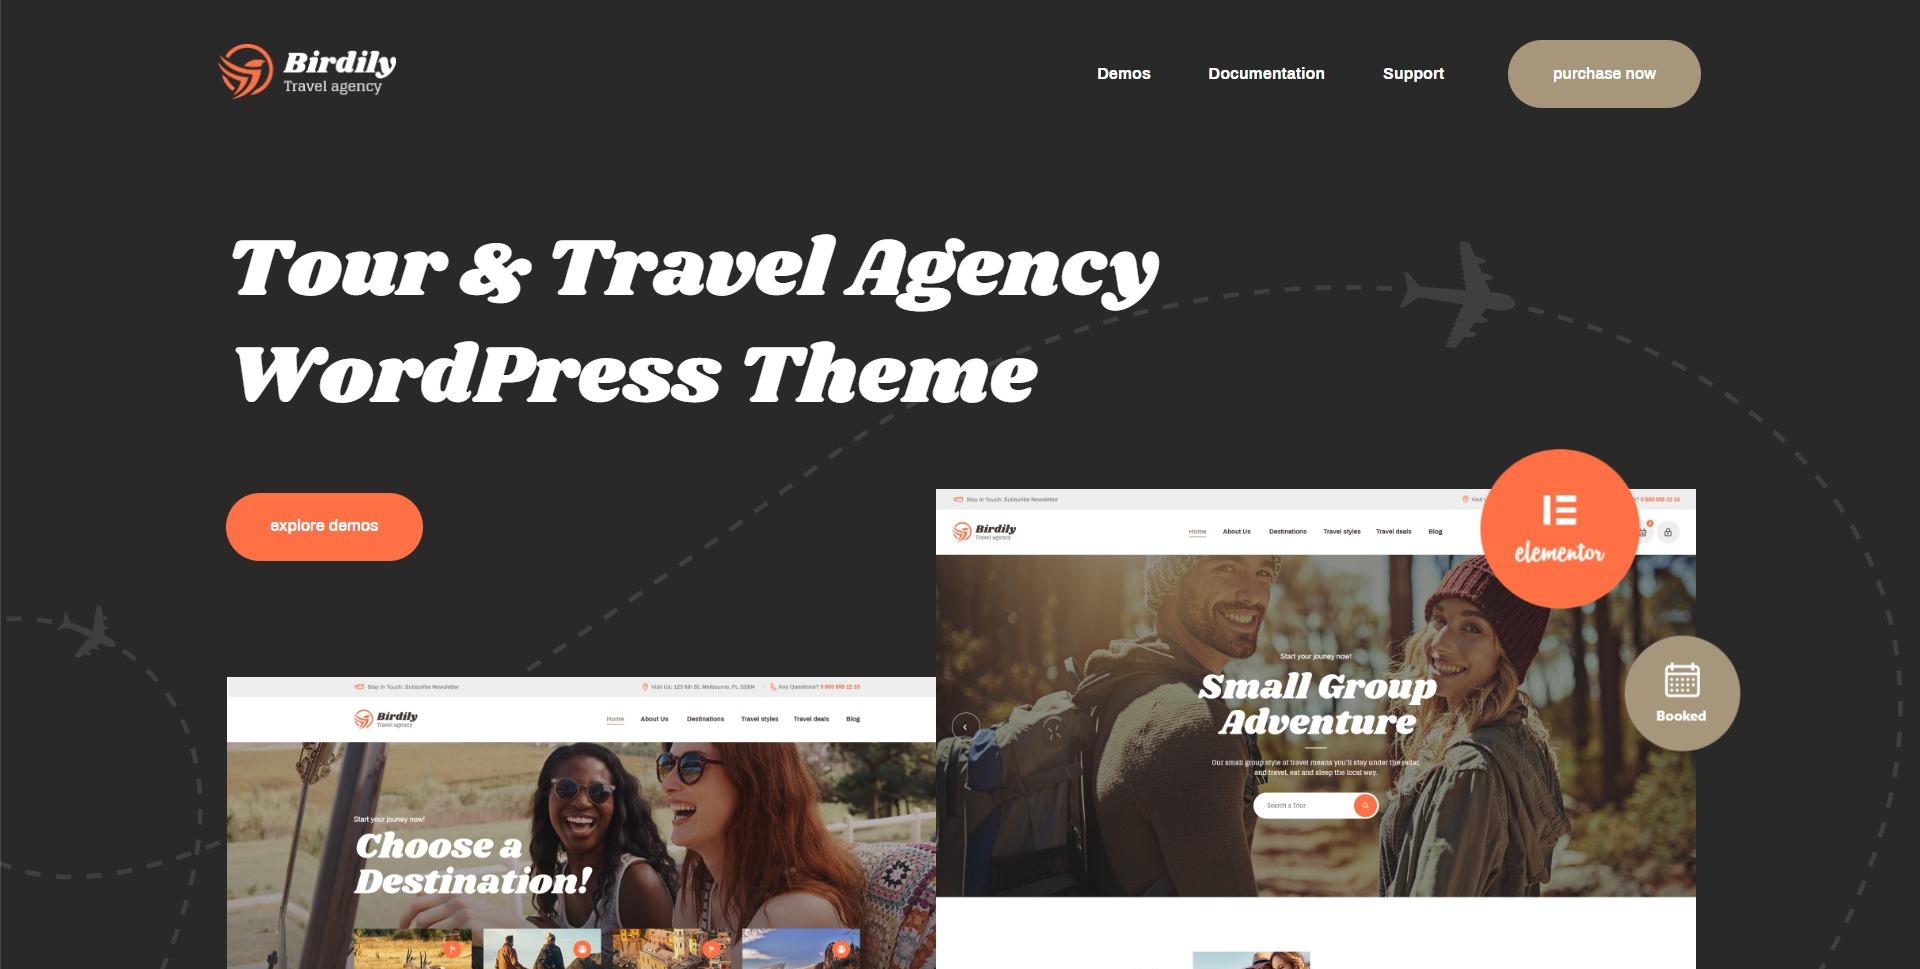 Birdily-网红旅行社旅游预订服务WordPress主题